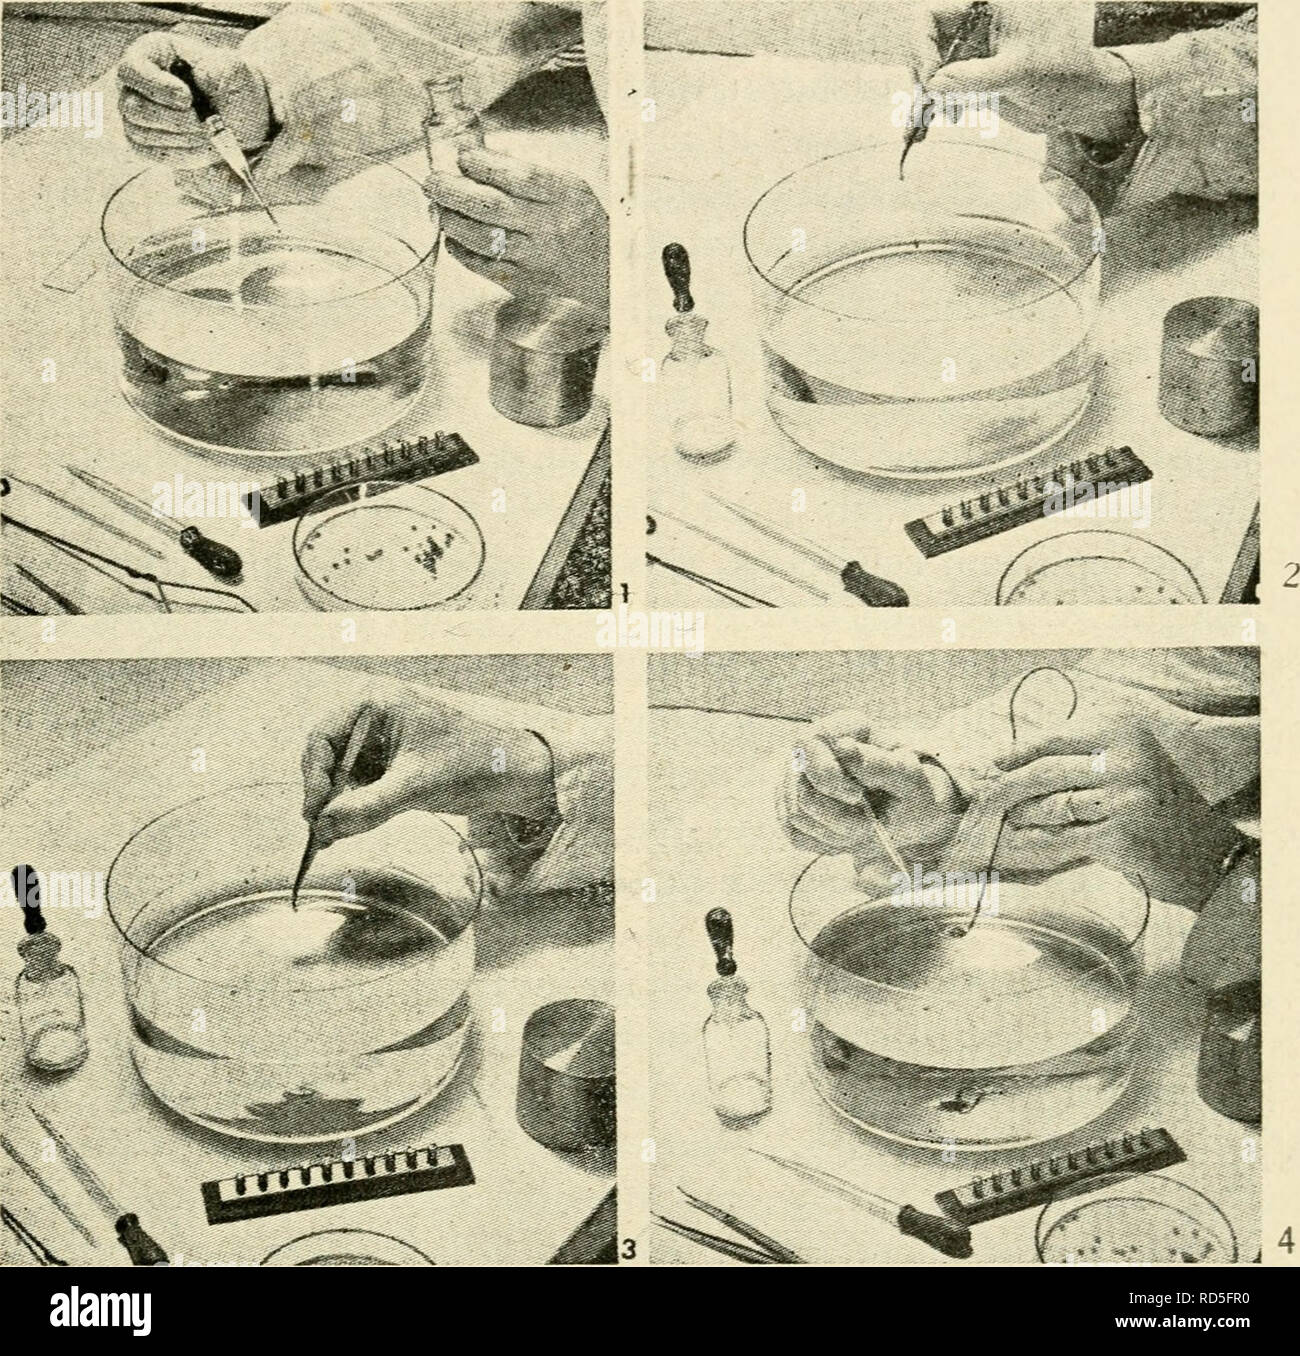 The electron microscope, its development, present